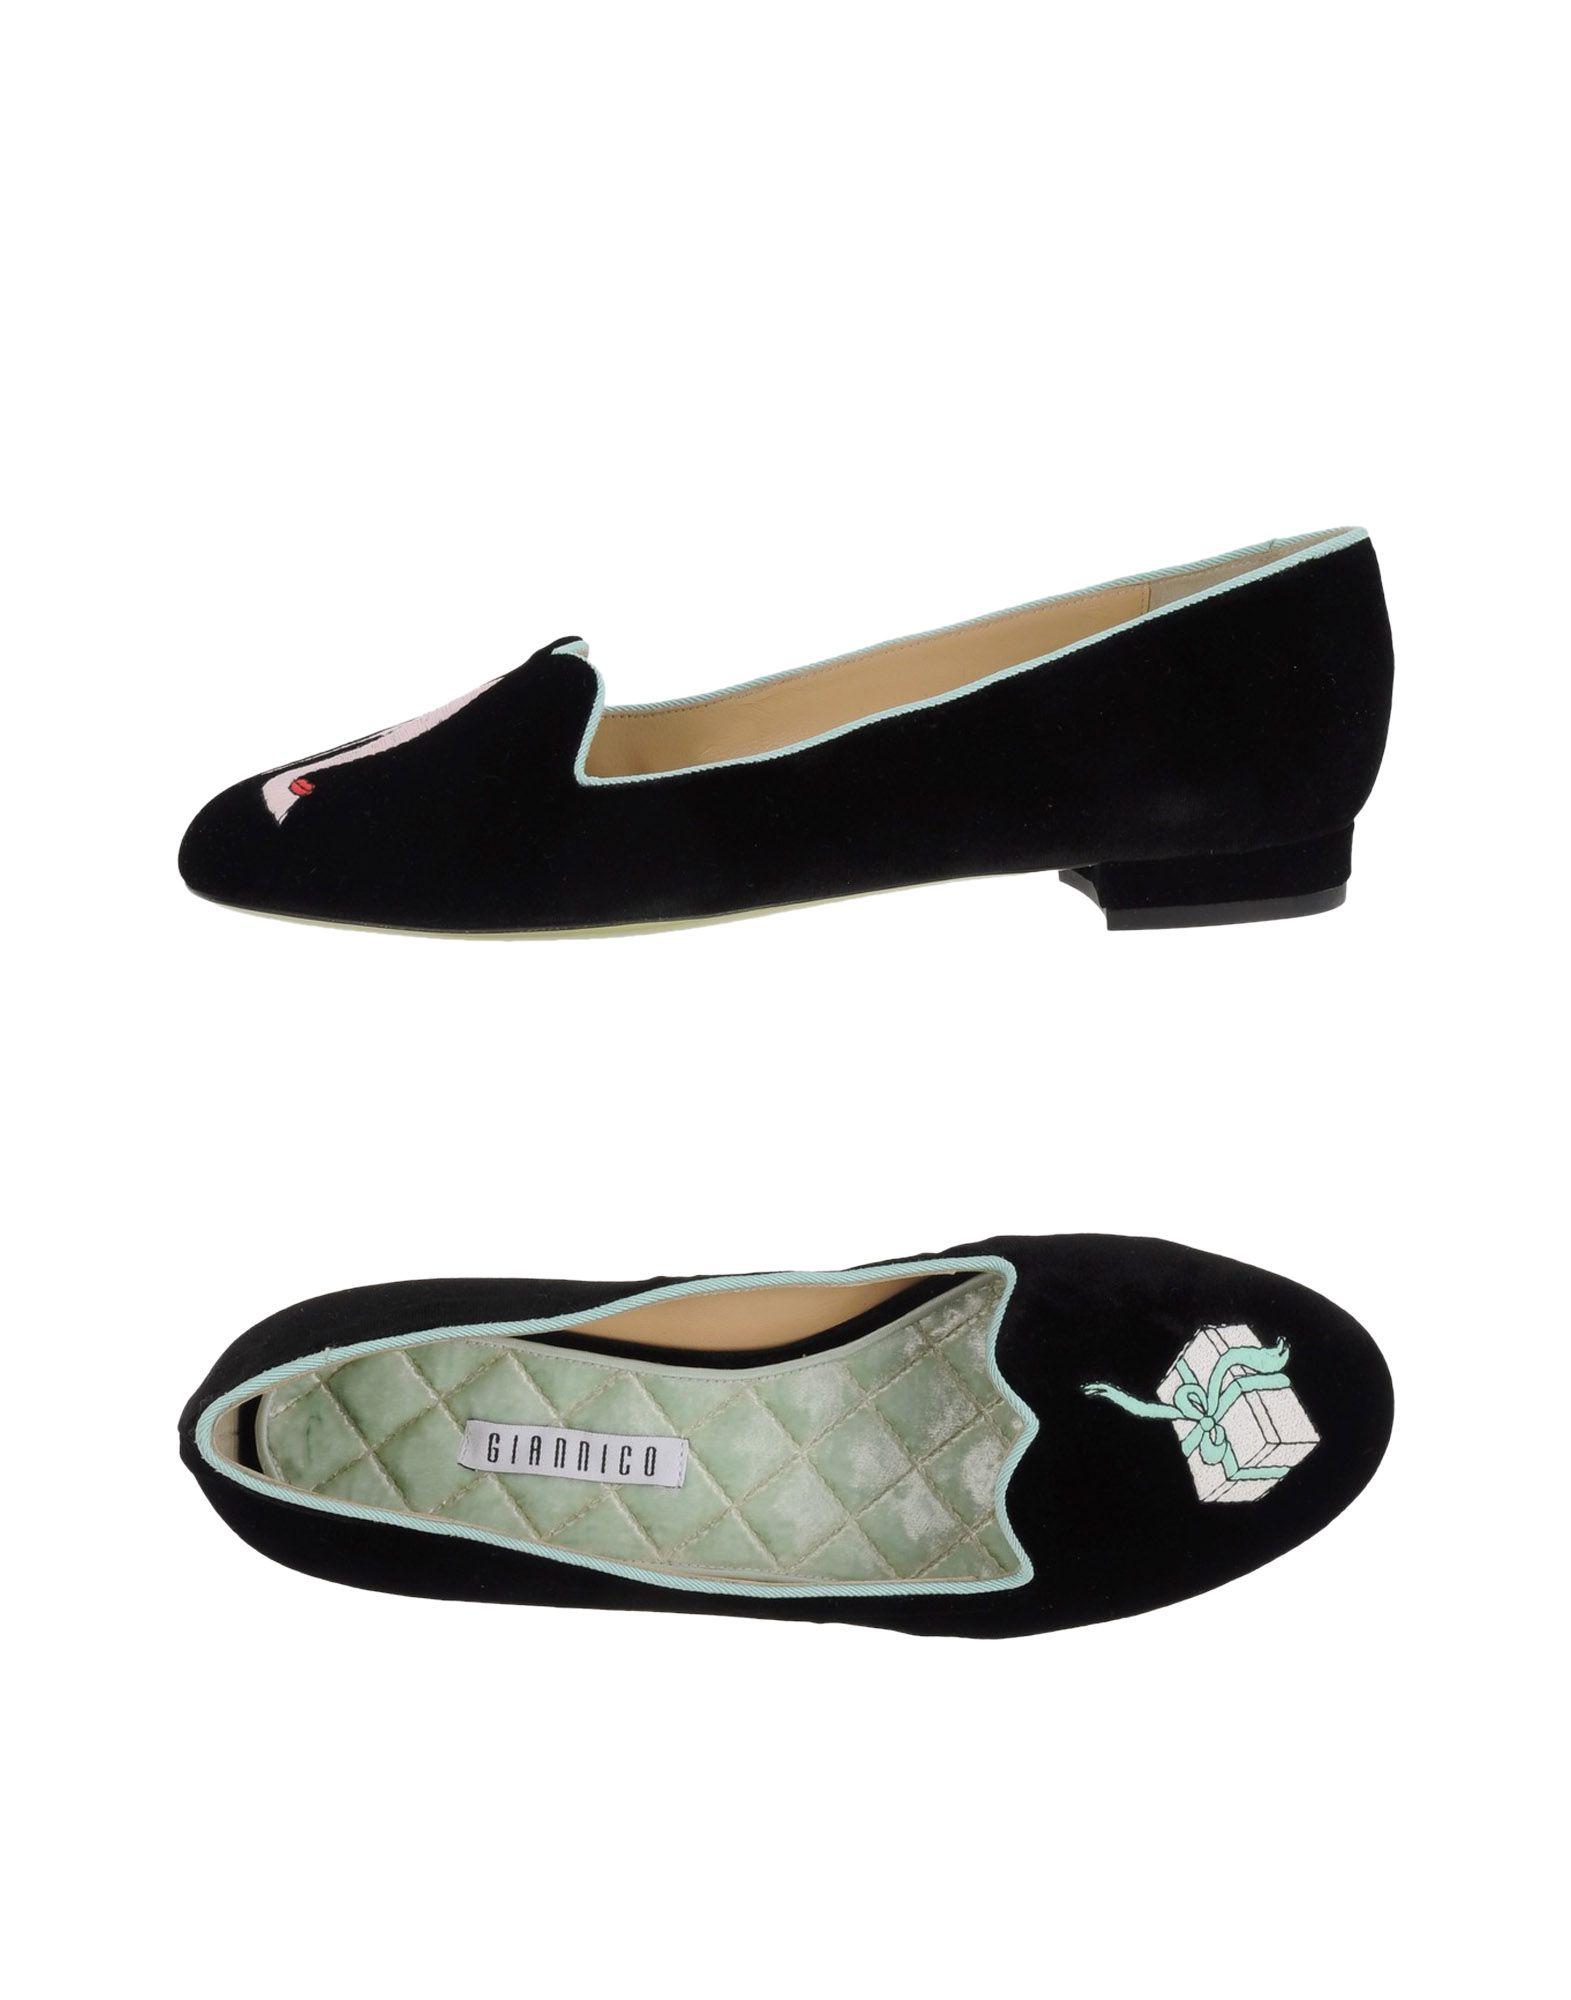 Giannico Mokassins Damen  11218802BV Gute Qualität beliebte Schuhe